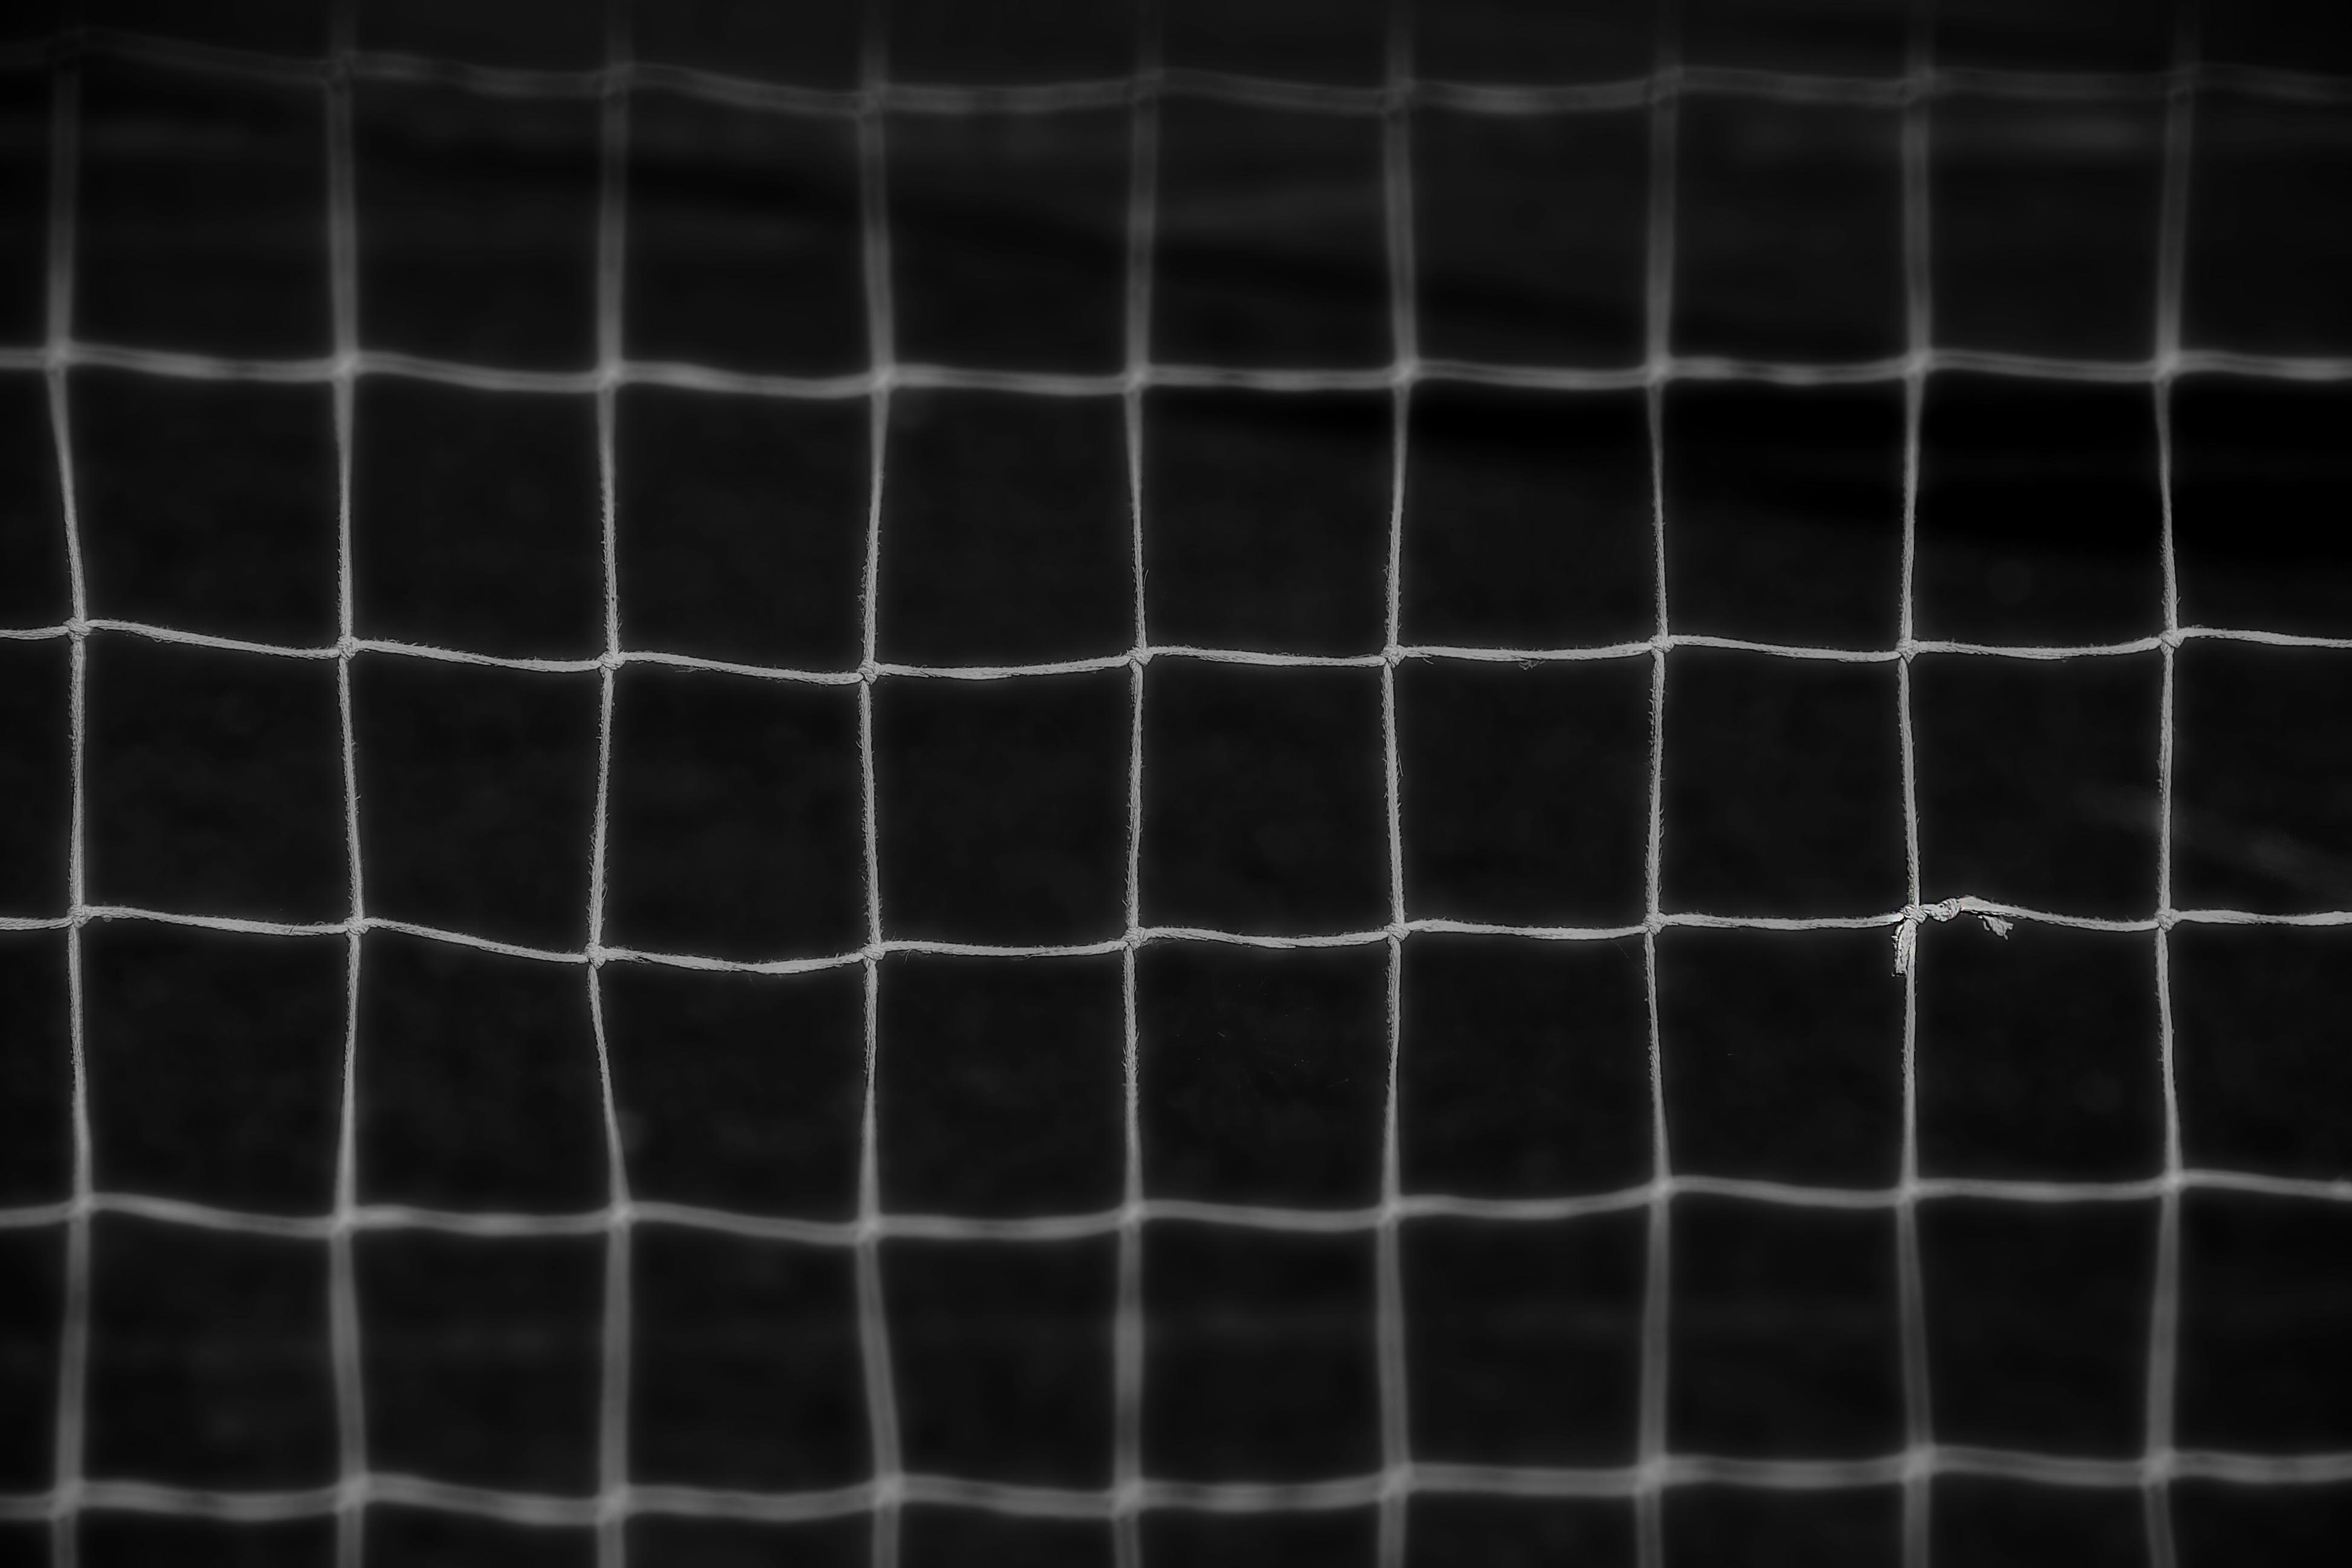 Soccer Pattern Wallpaper